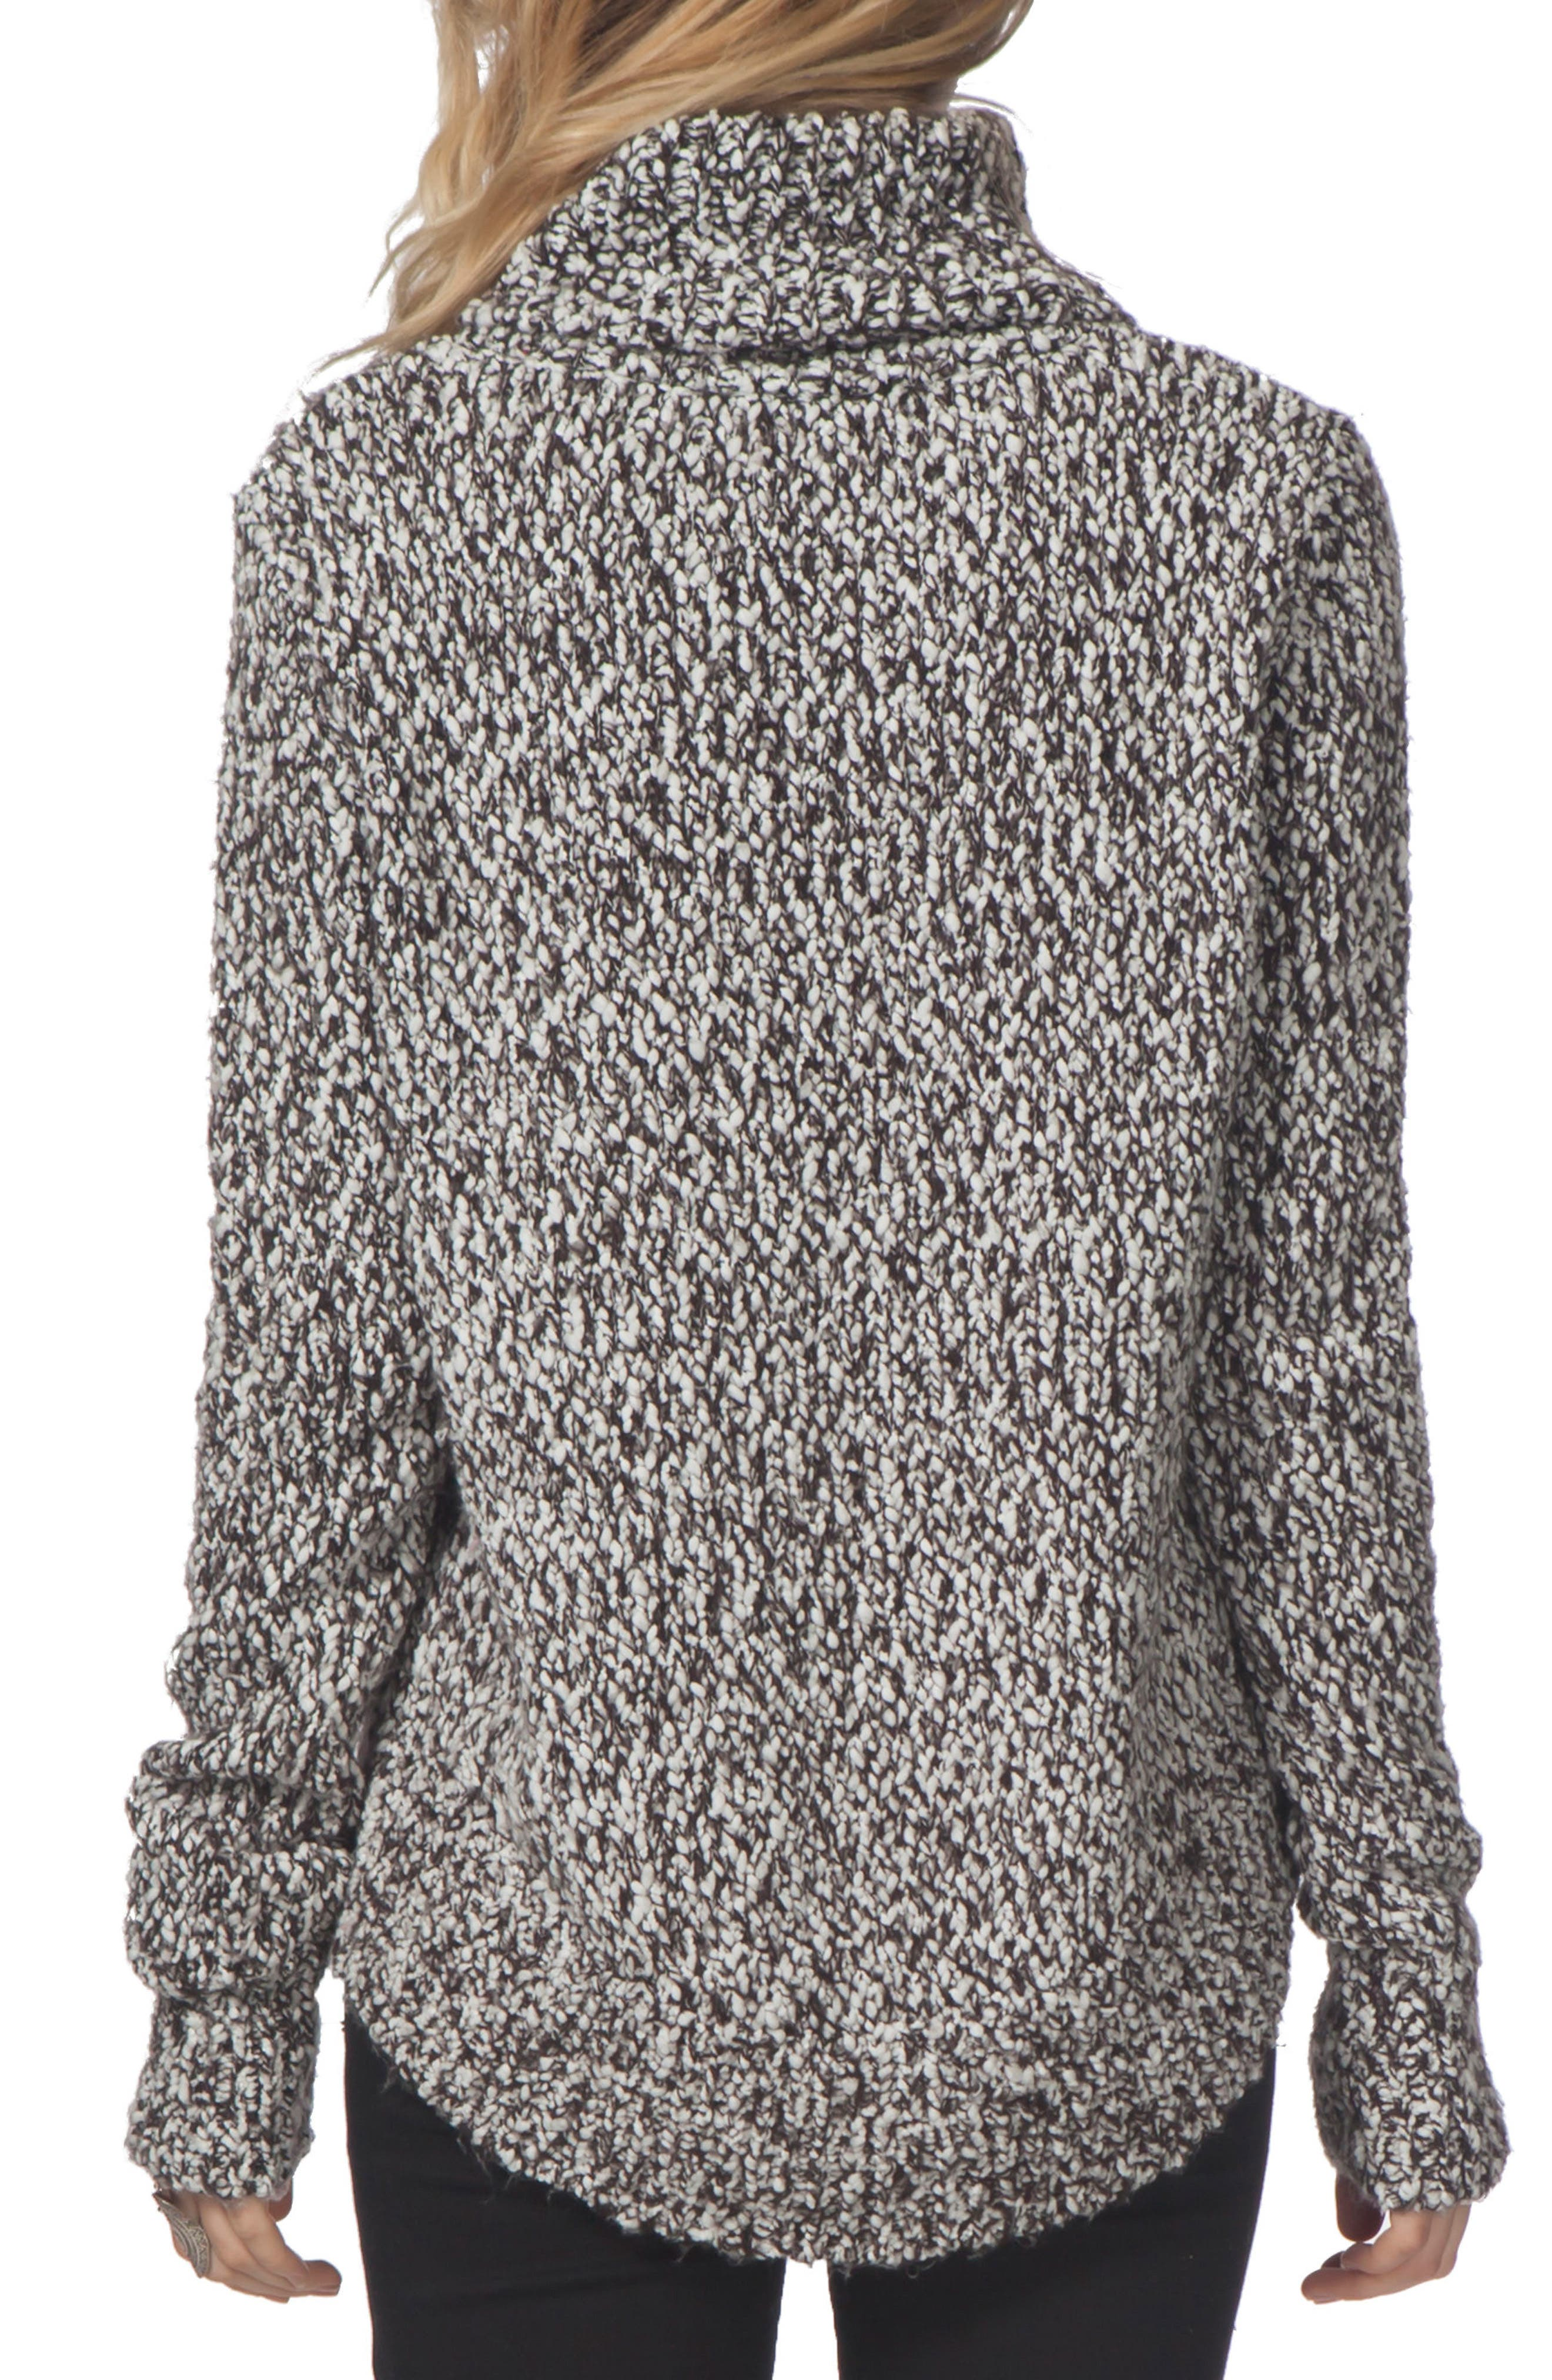 Sailor Turtleneck Sweater,                             Alternate thumbnail 2, color,                             Black/ White